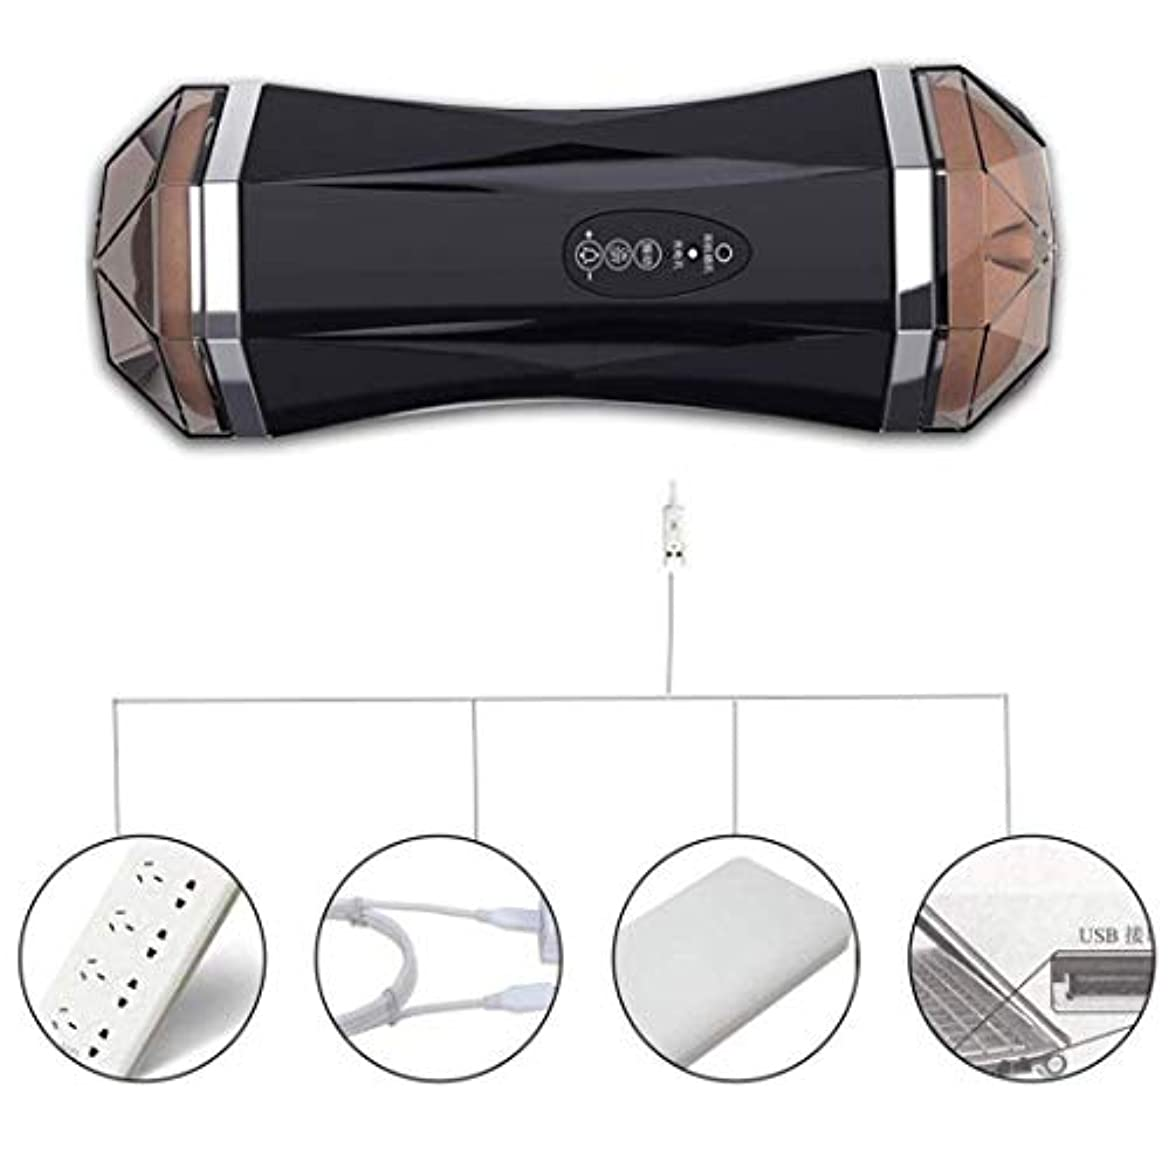 CRFJB 男性用Tシャツアンダーウェアノイズレスリアルインテリジェント8周波数PístonVǐbrǎtiǒnMássageCup Handheld Personal Body Massager